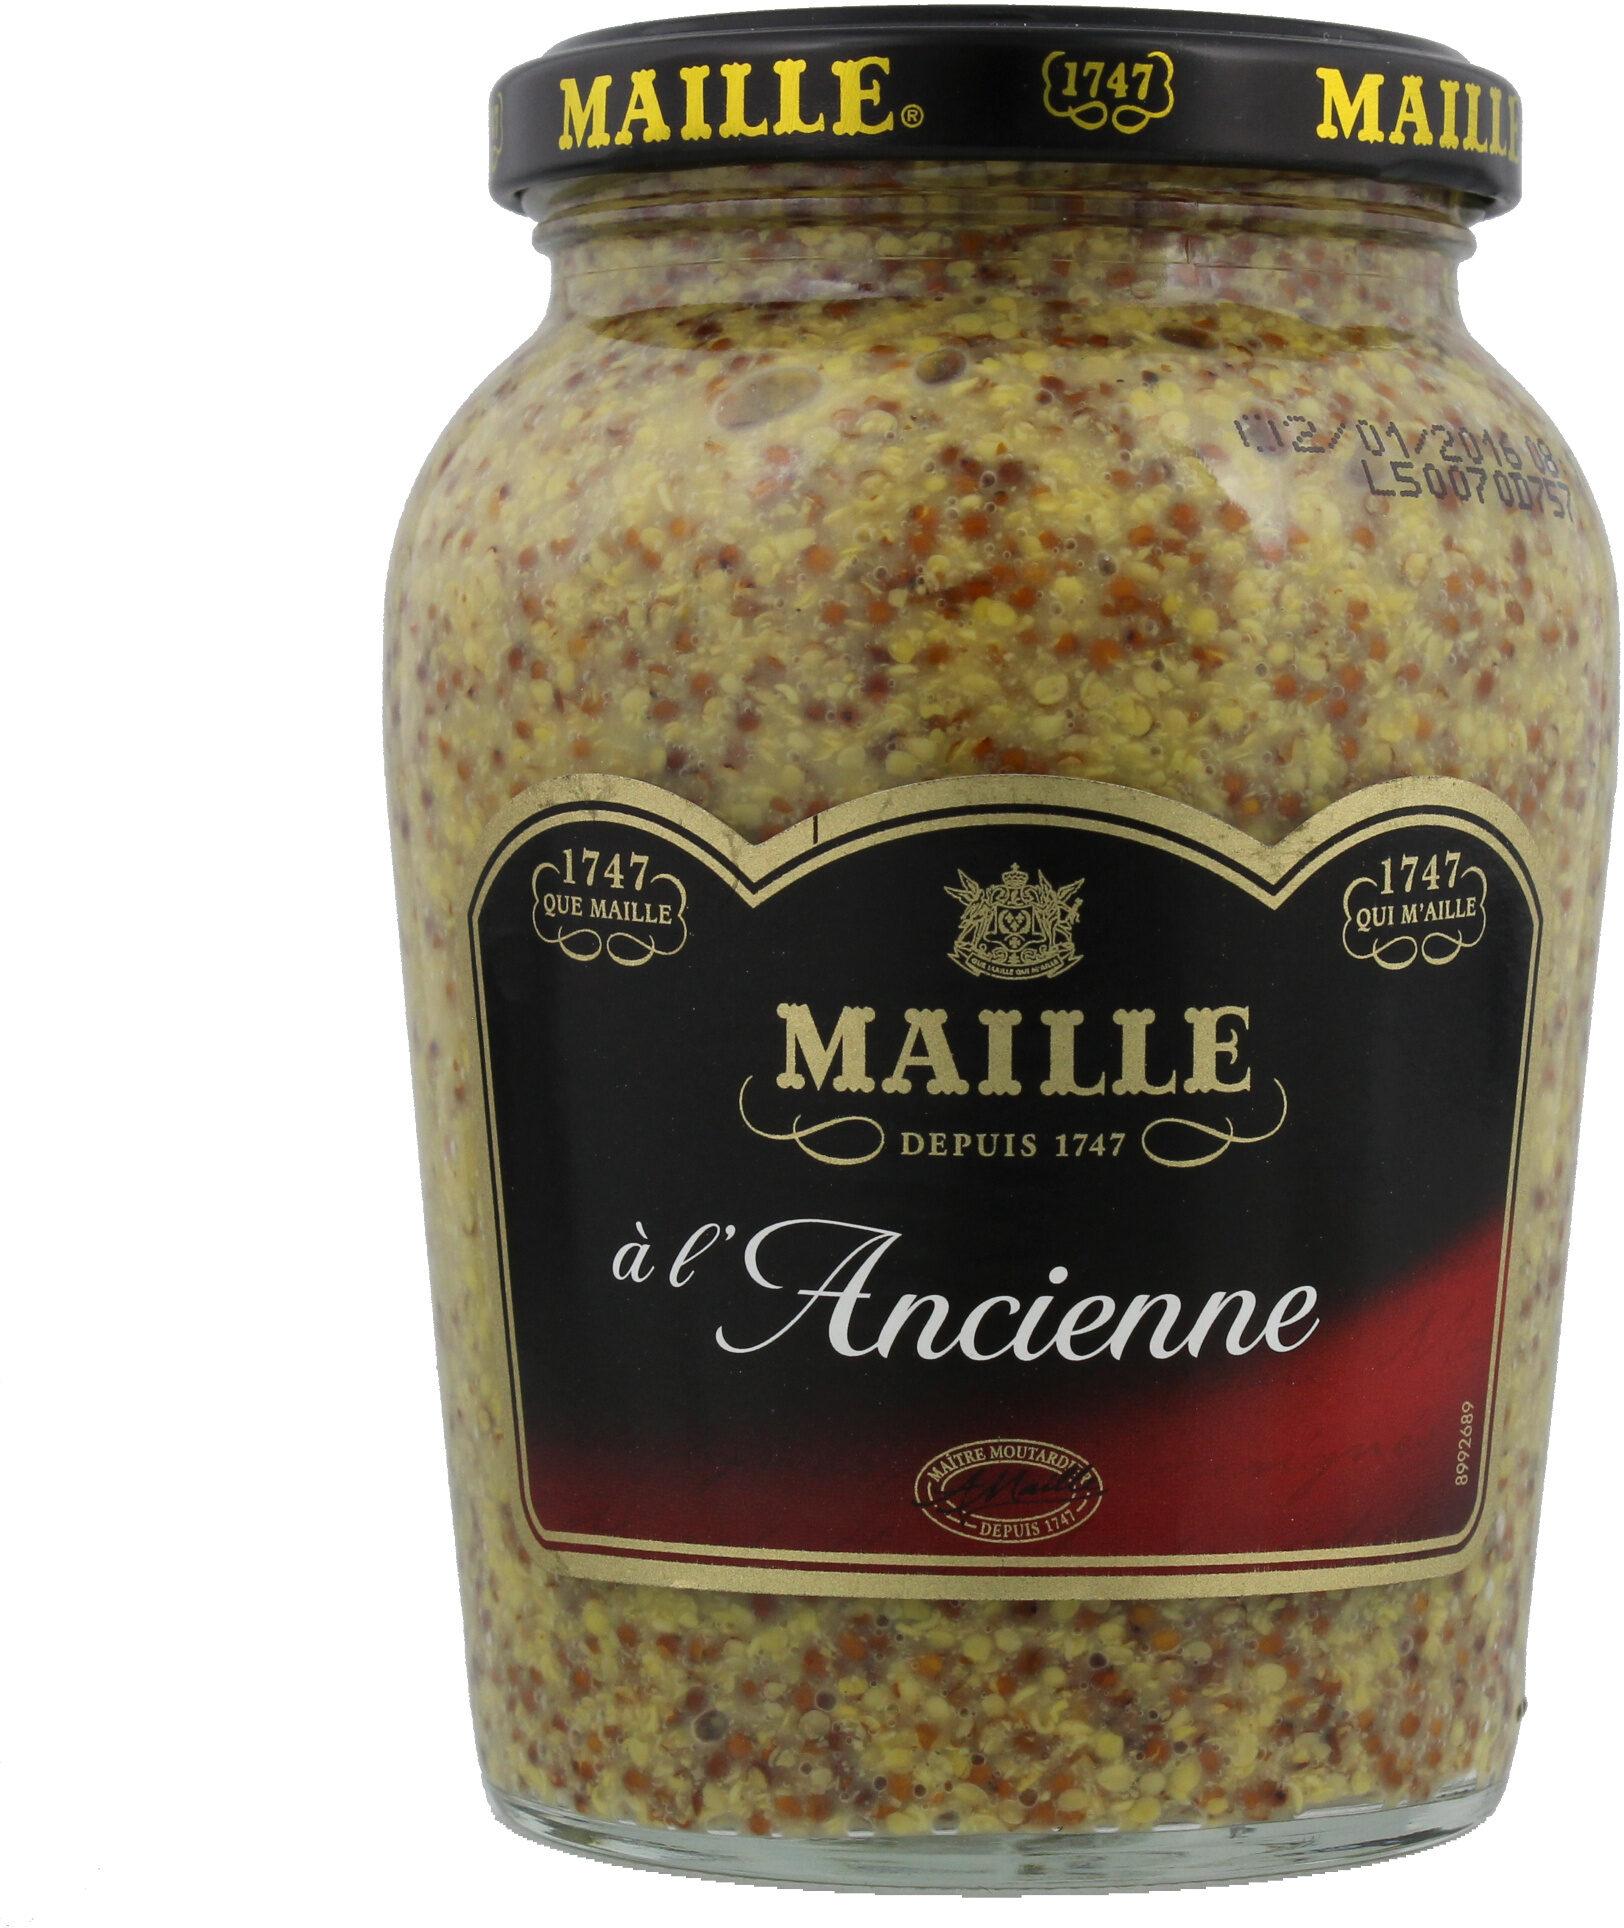 Maille Moutarde à l'Ancienne Bocal 380g - نتاج - fr